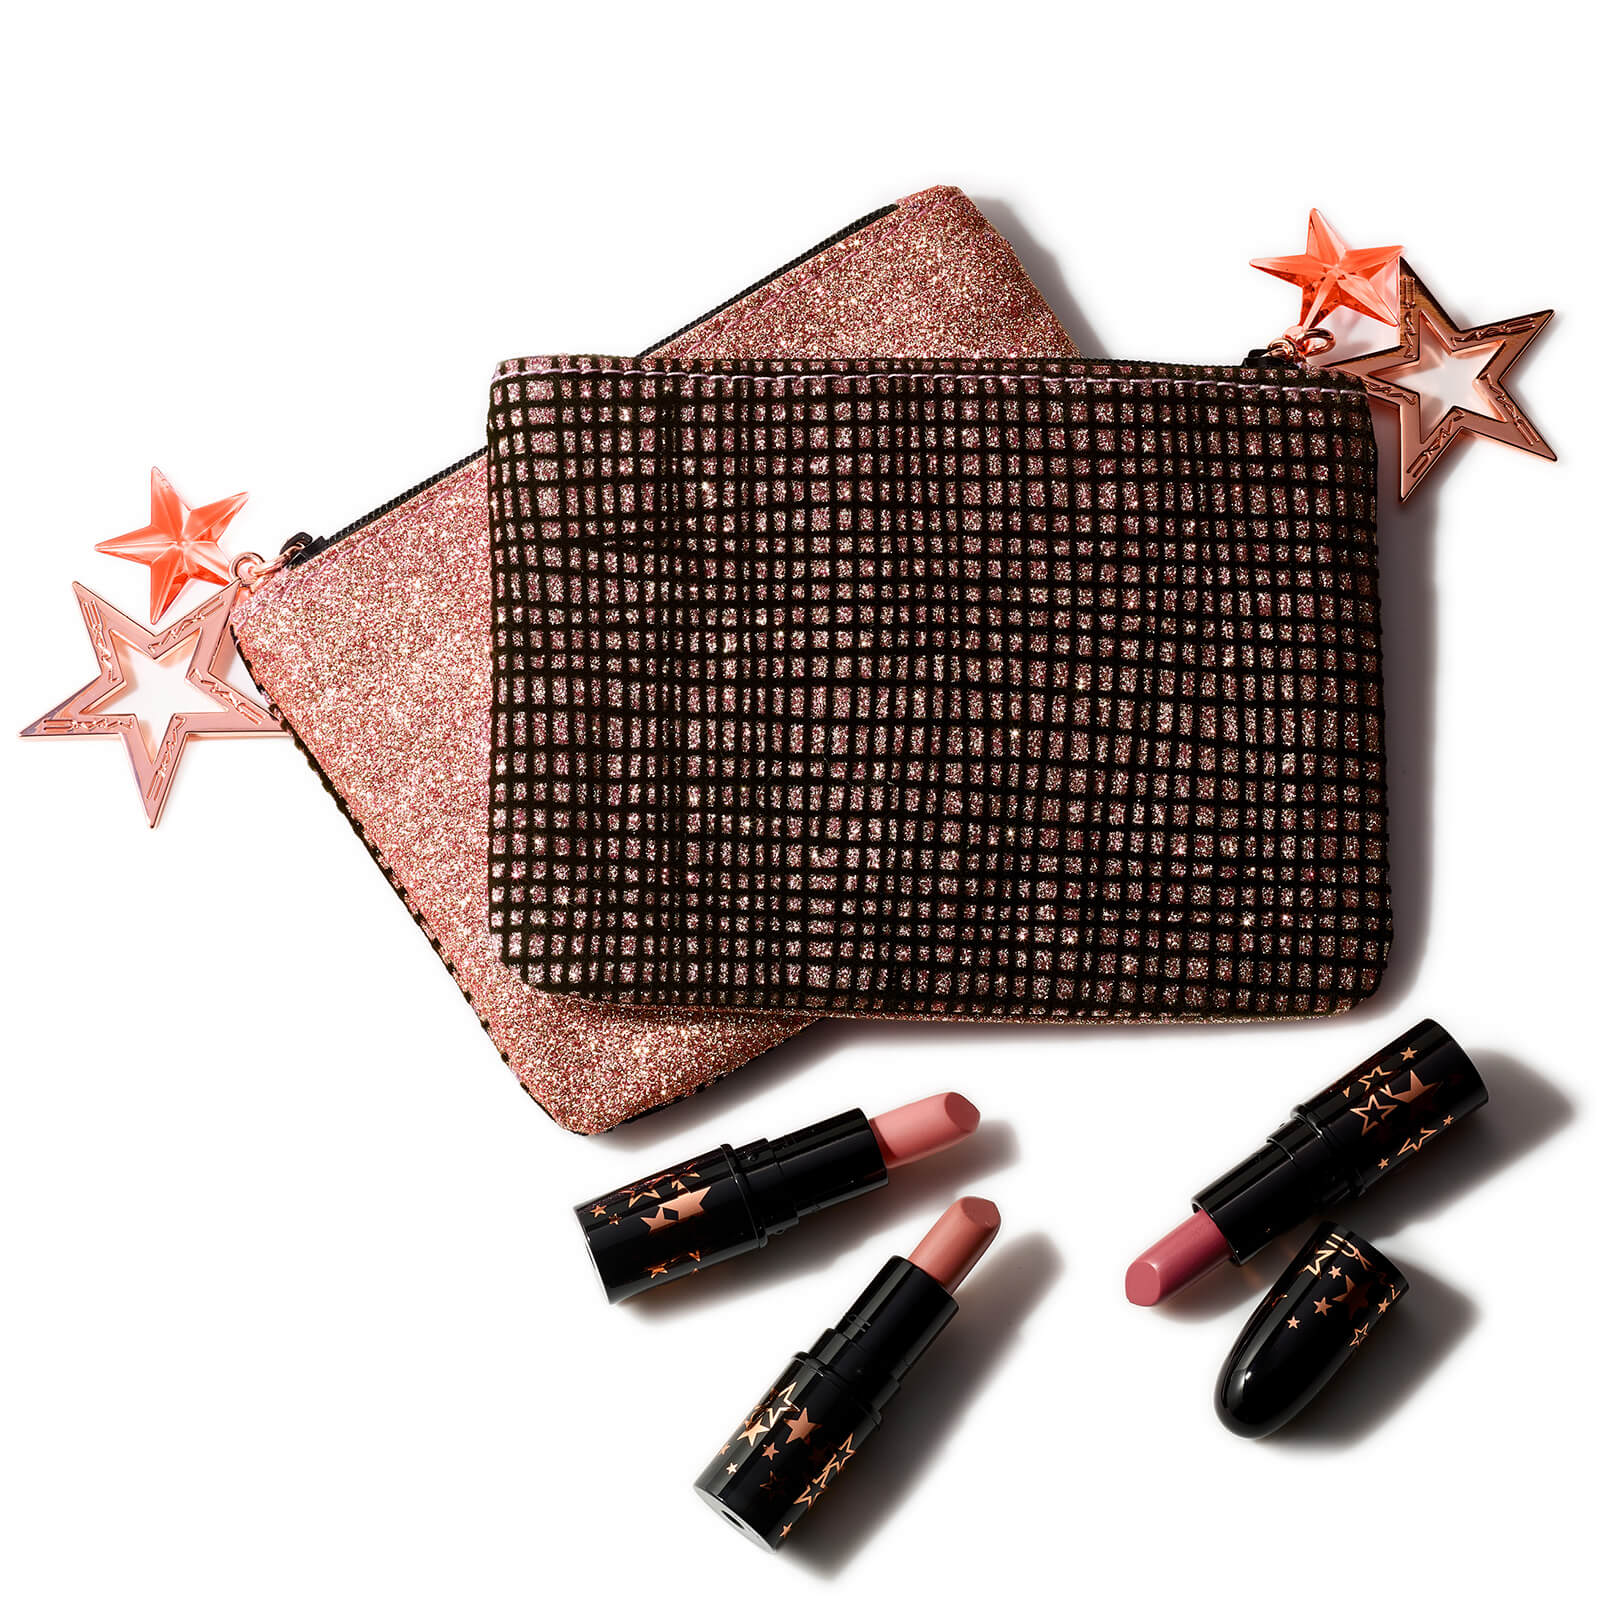 MAC Lucky Stars Lipstick Kit Warm (Worth £30.00)